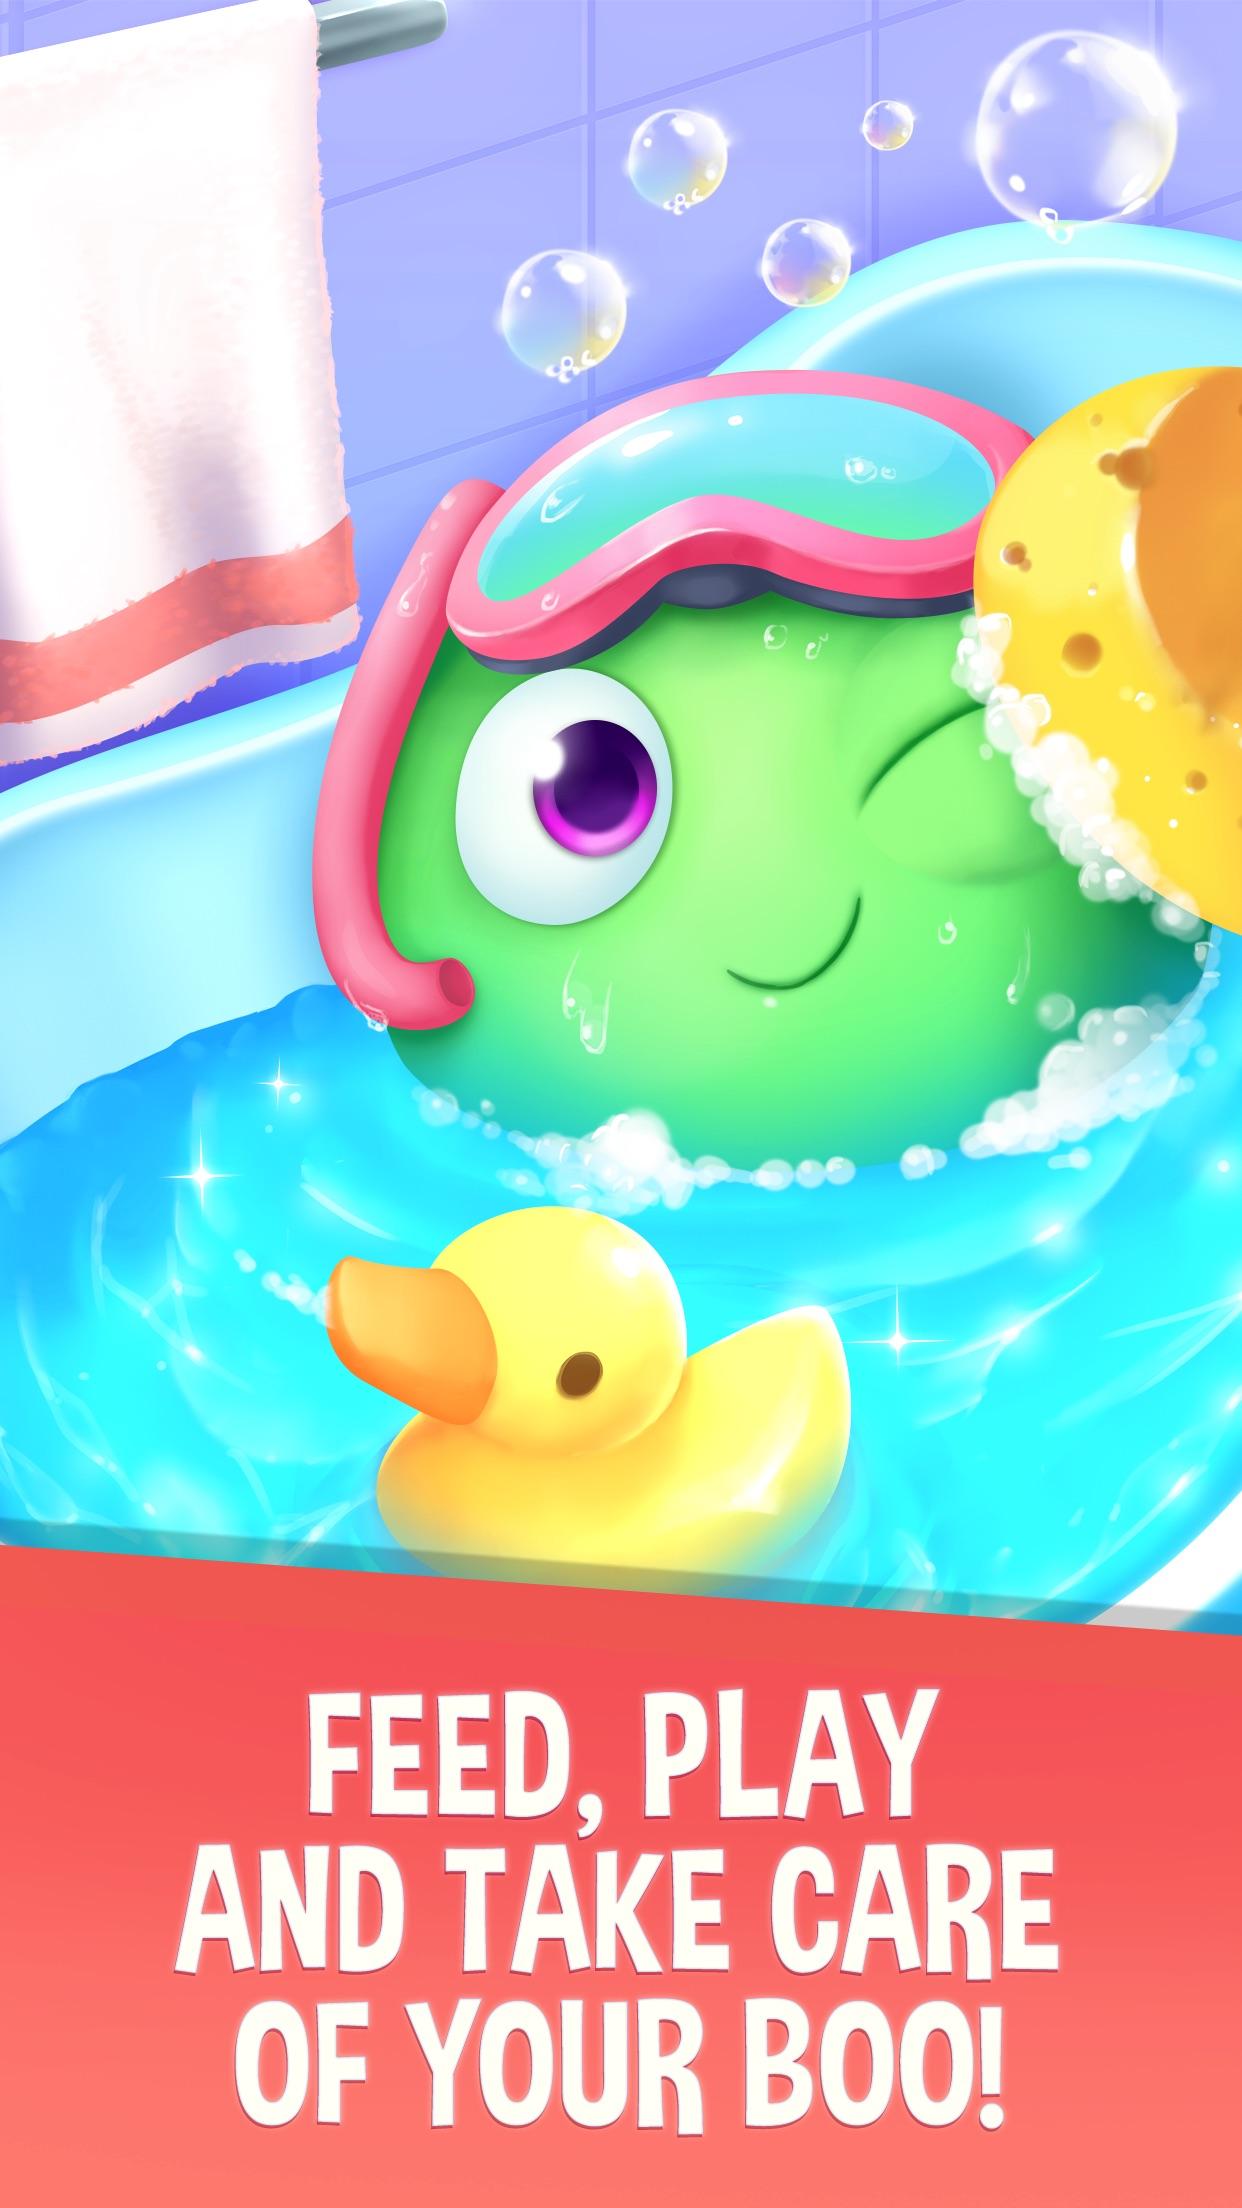 My Boo Virtual Pet & Mini Game Screenshot